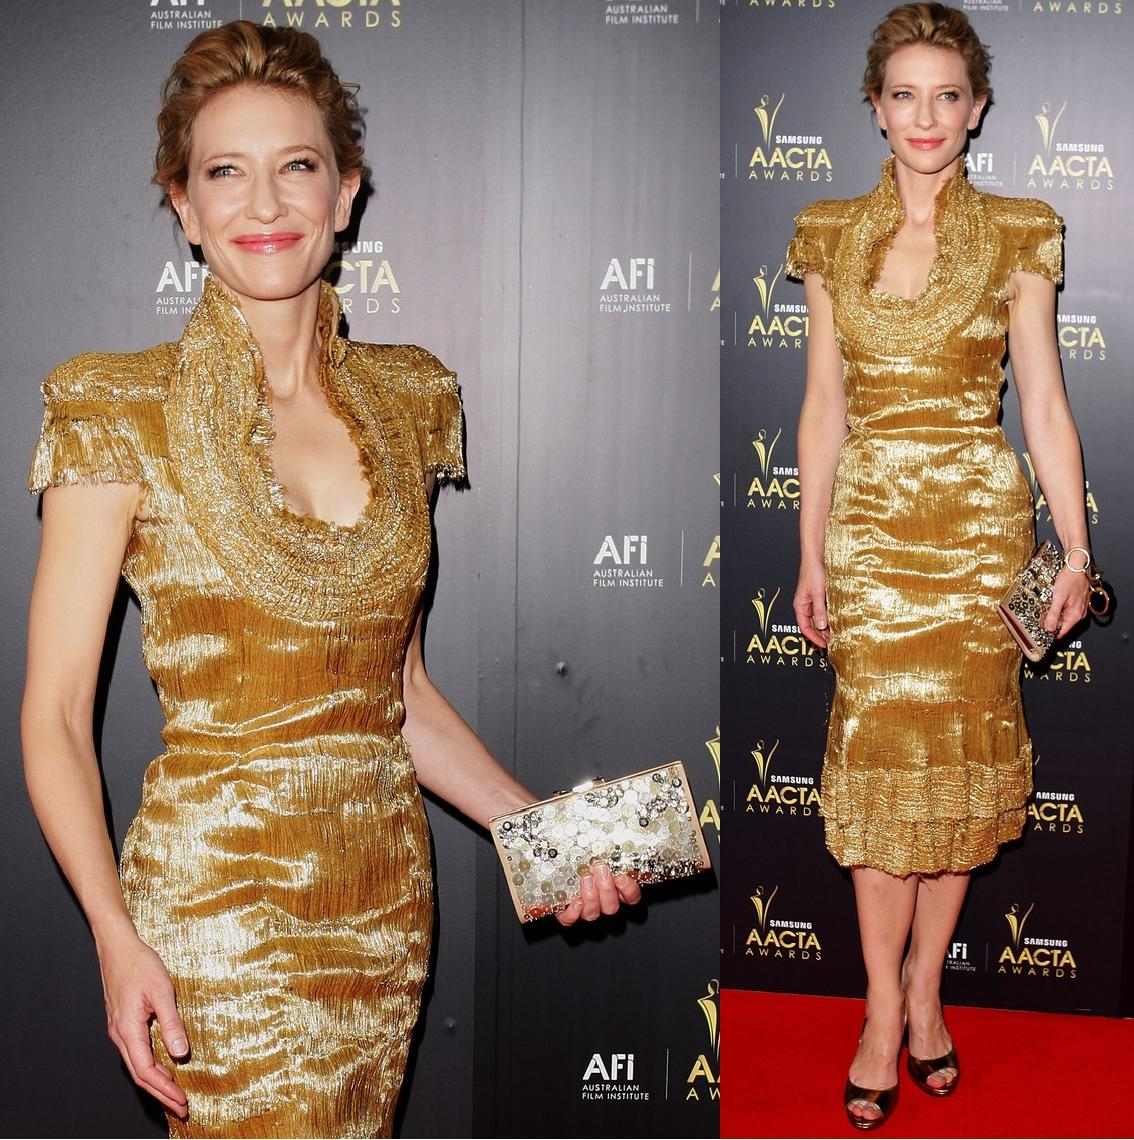 http://1.bp.blogspot.com/-ITPIuI1kugY/TygS9pfgZqI/AAAAAAAAEqI/wELLGx0y4h8/s1600/Cate+Blanchett+In+Alexander+McQueen+Spring+2012+-+AACTA+Awards.jpg